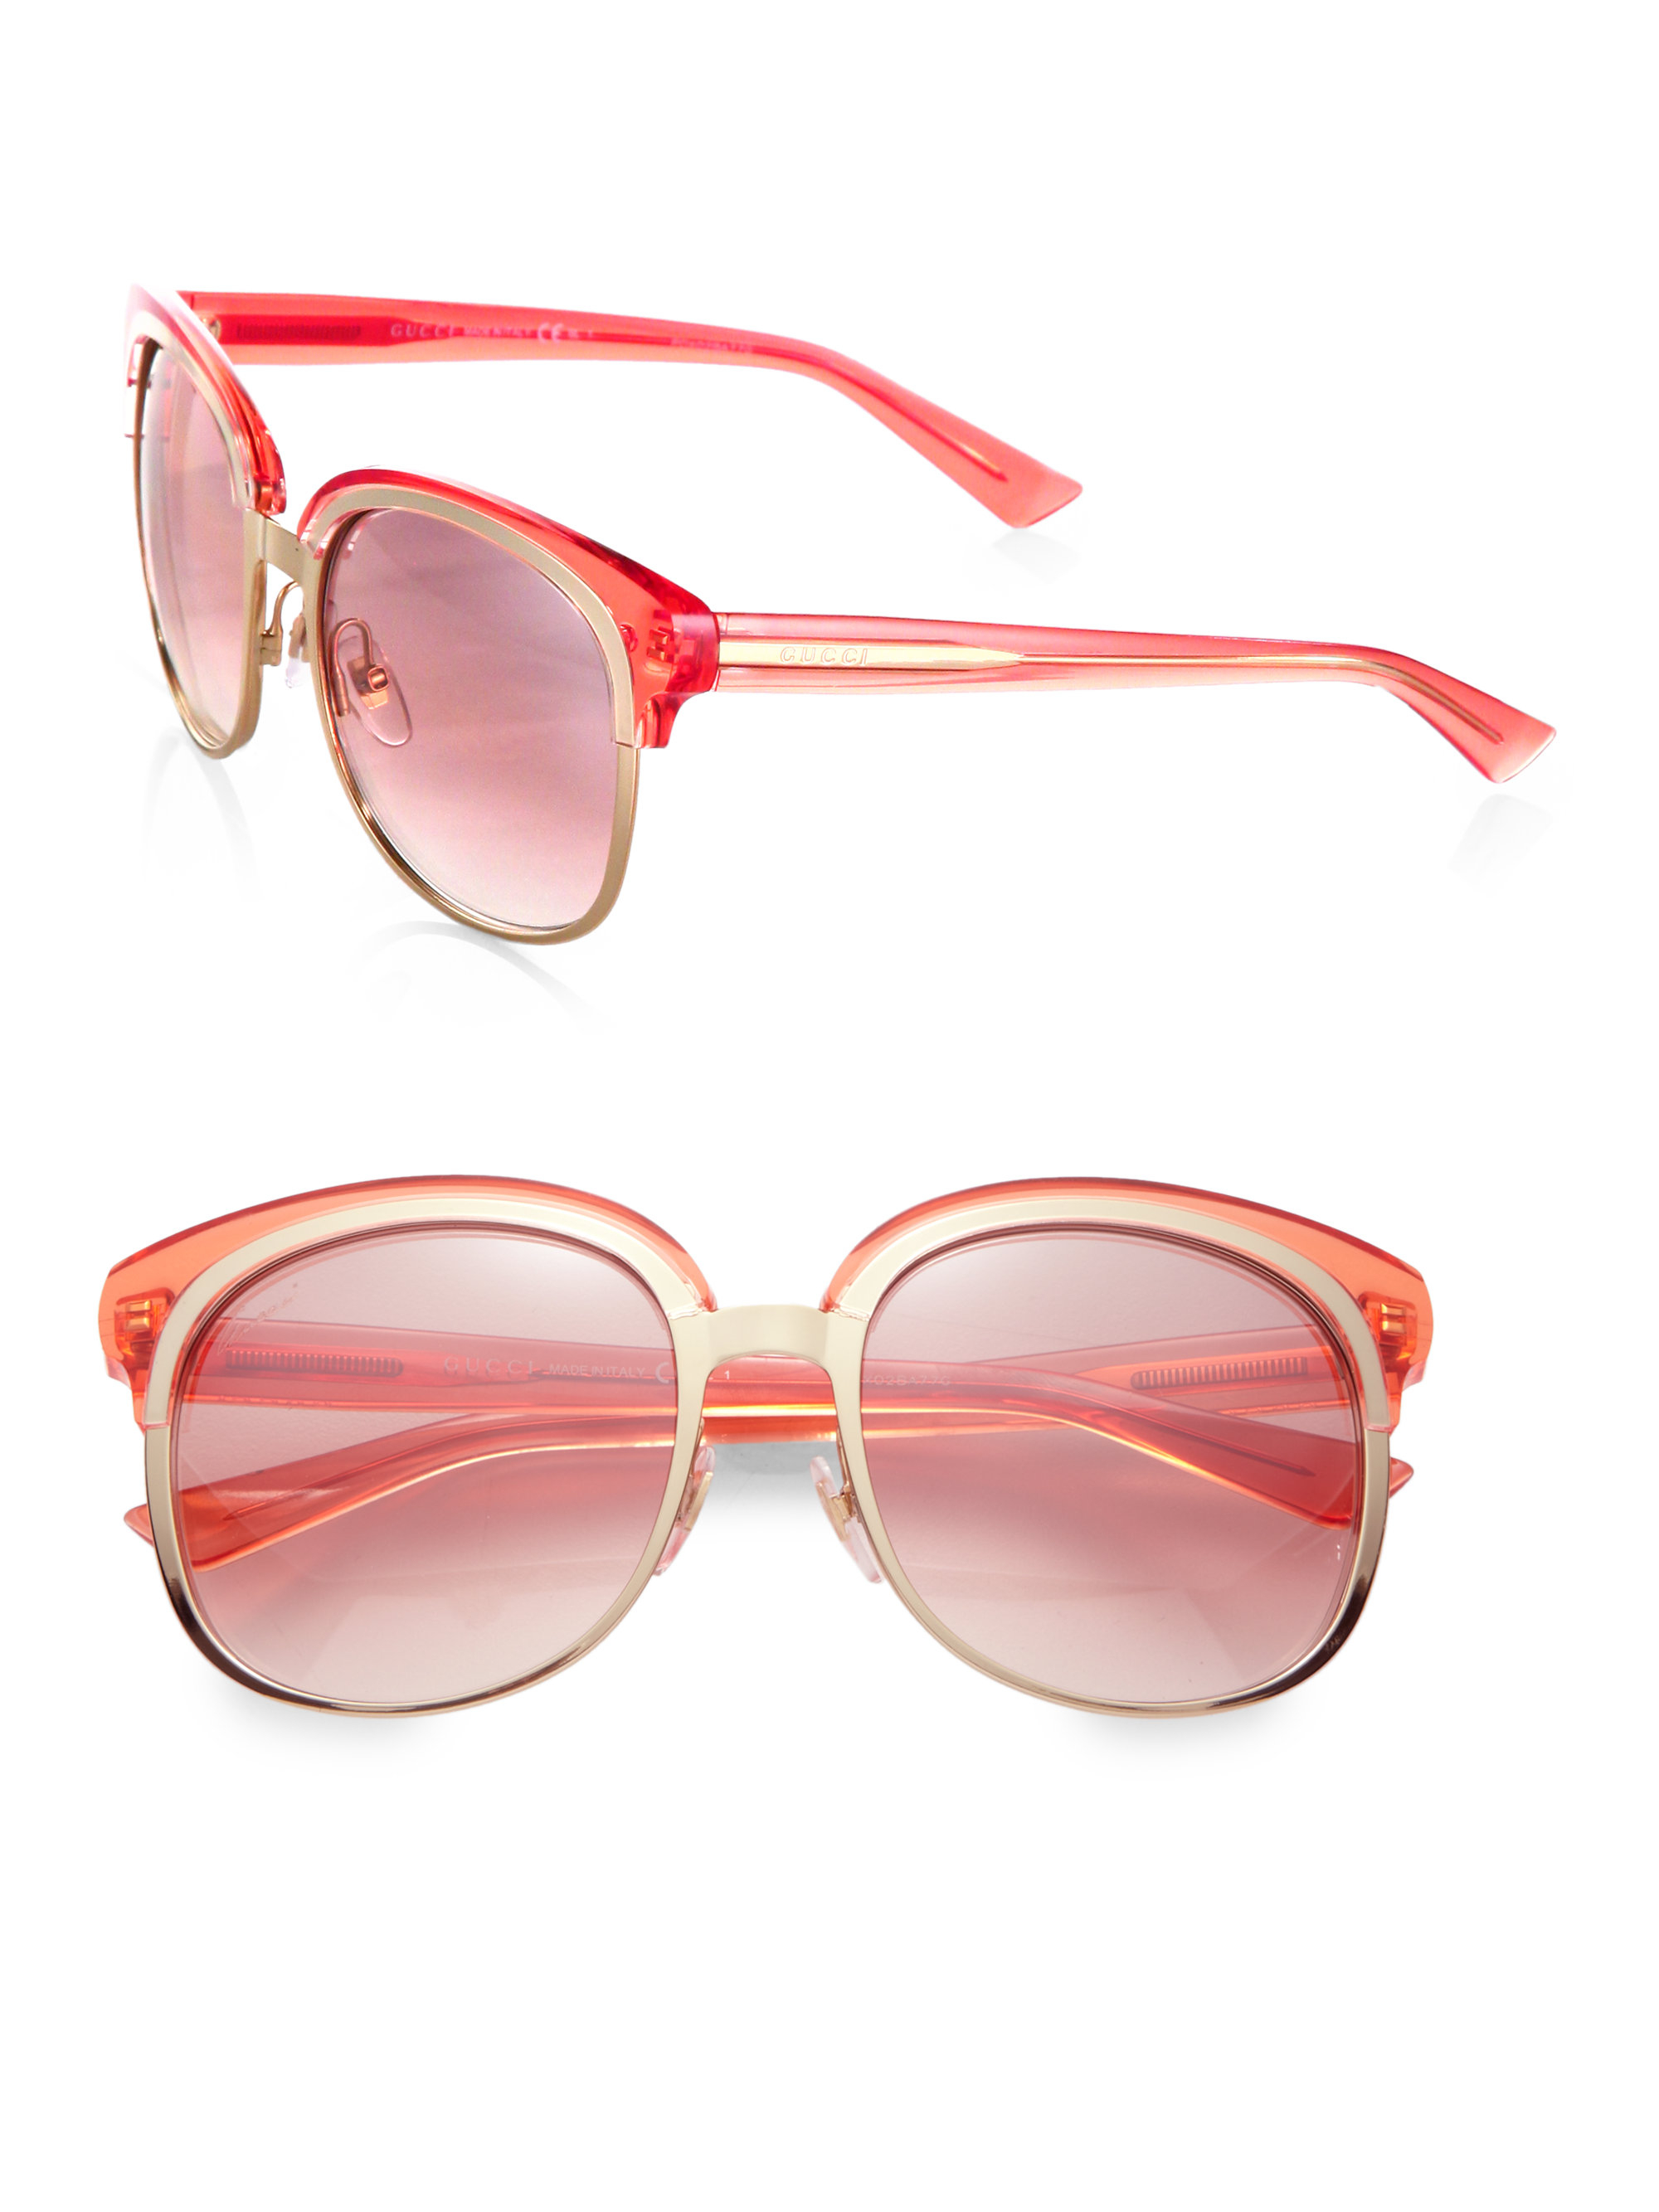 7e30ed0226baa Gucci Oversized Plastic Metal Round Sunglasses in Metallic